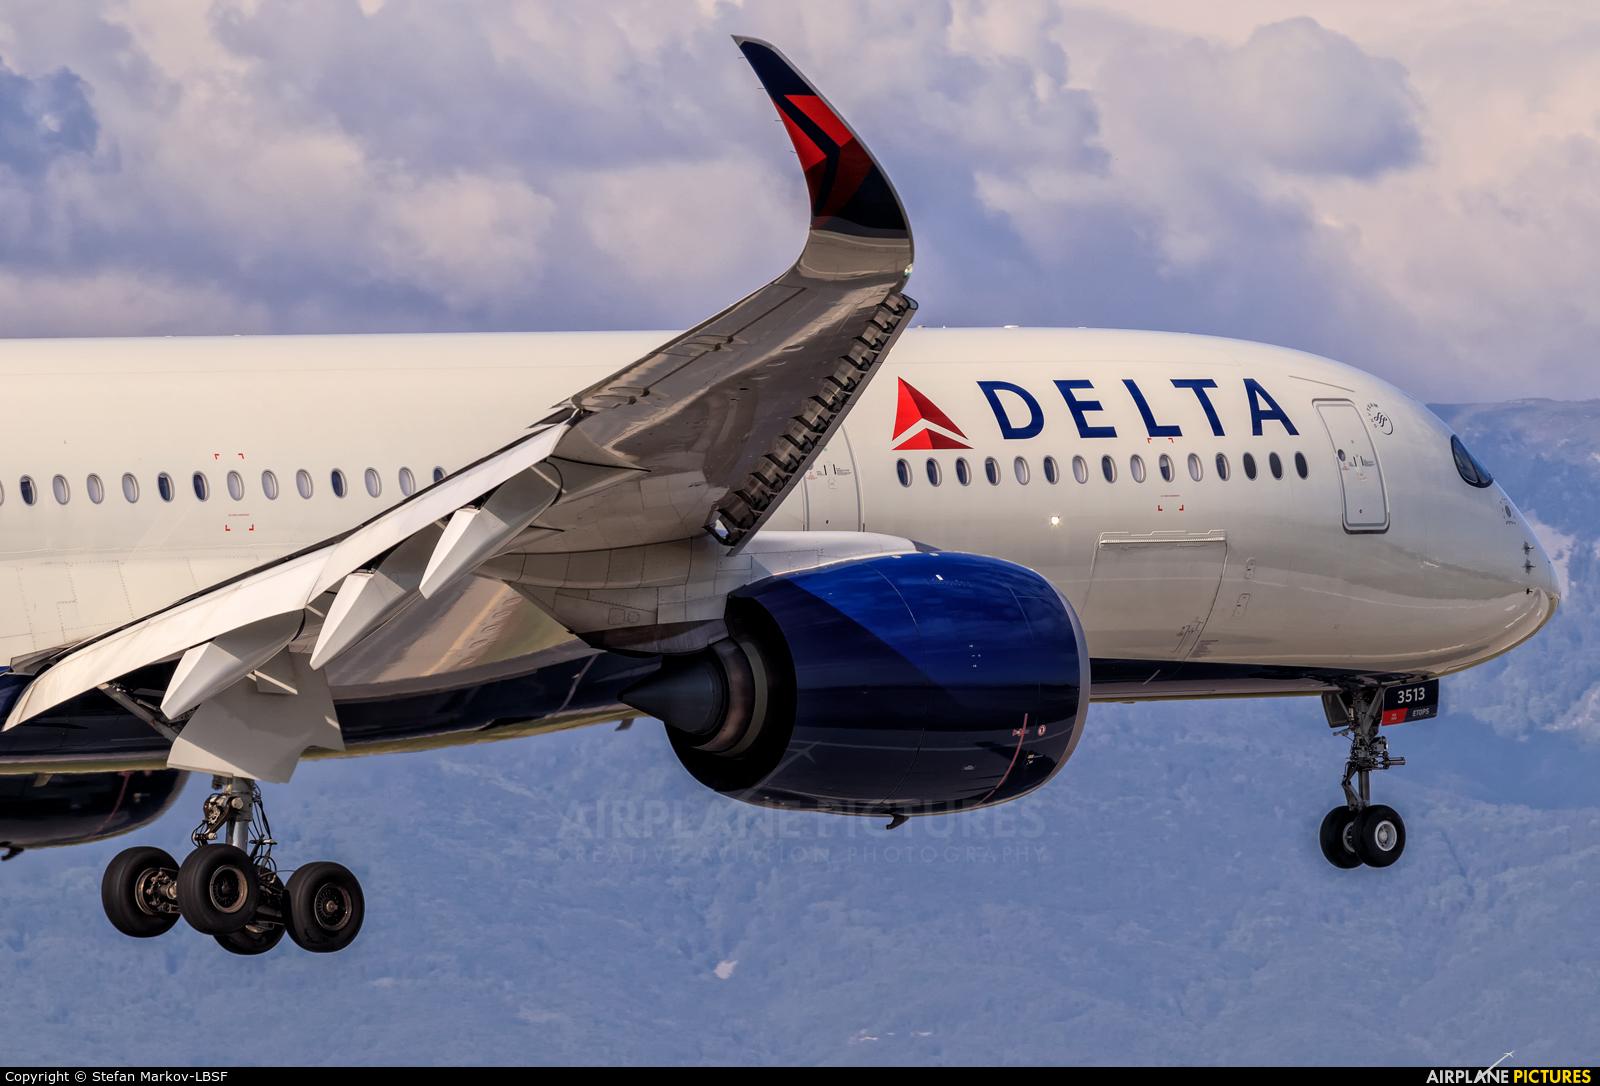 Delta Air Lines N513DZ aircraft at Sofia